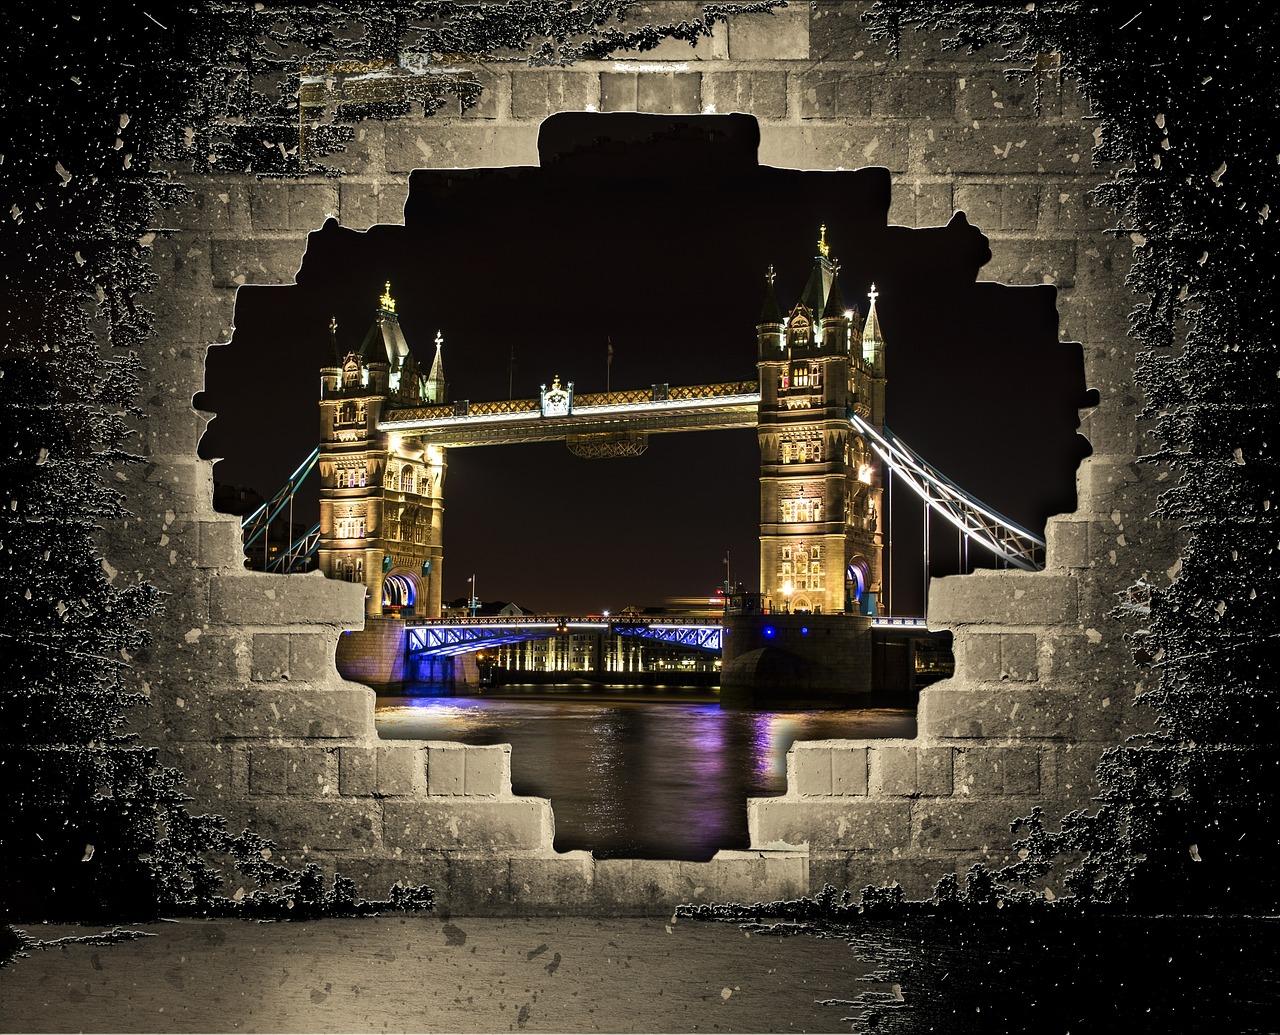 wall-1444486_1280.jpg